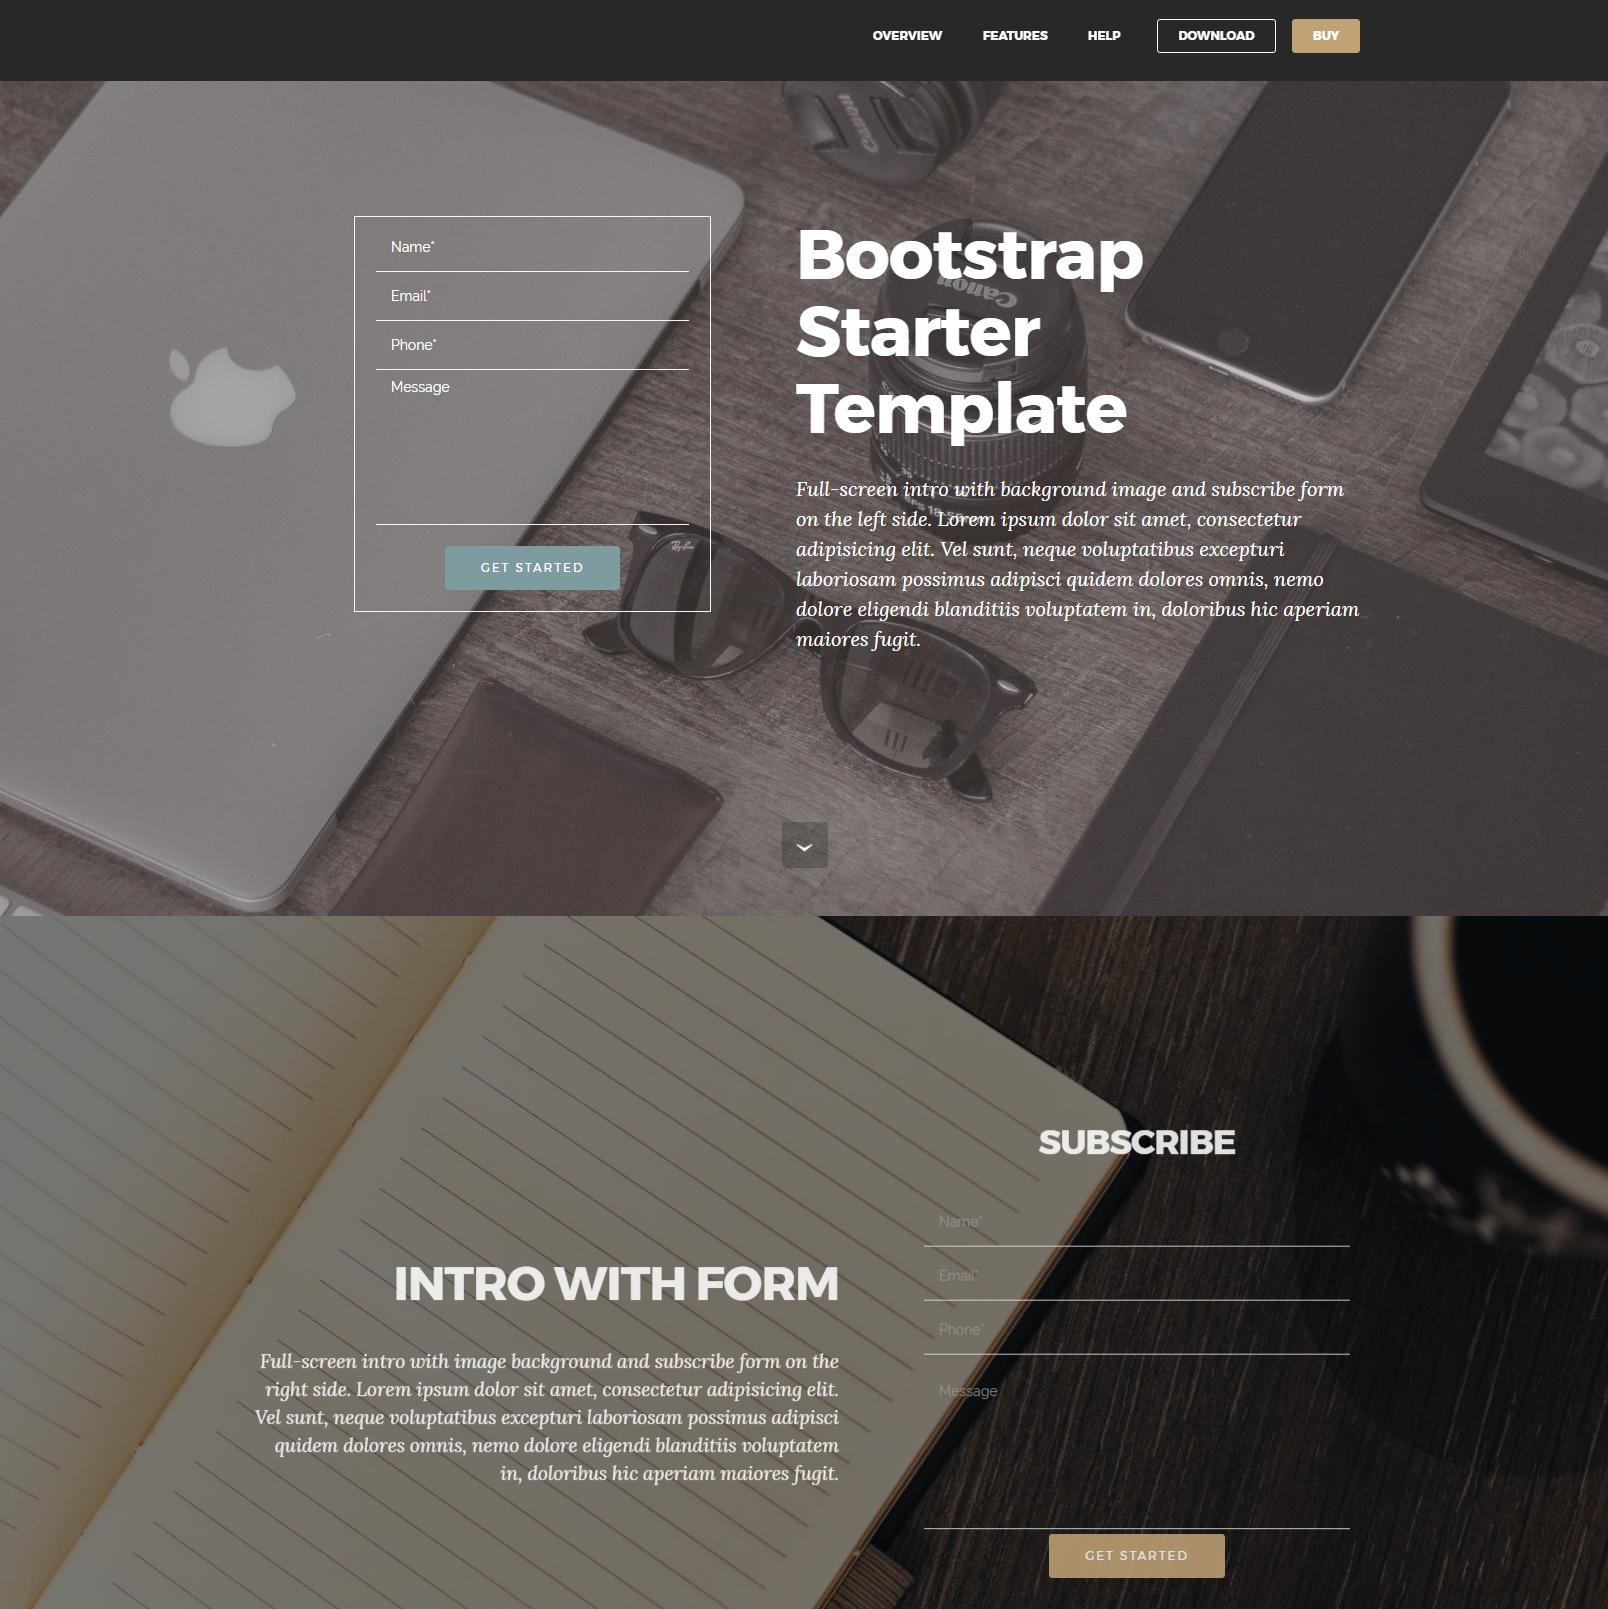 HTML Bootstrap Starter Templates